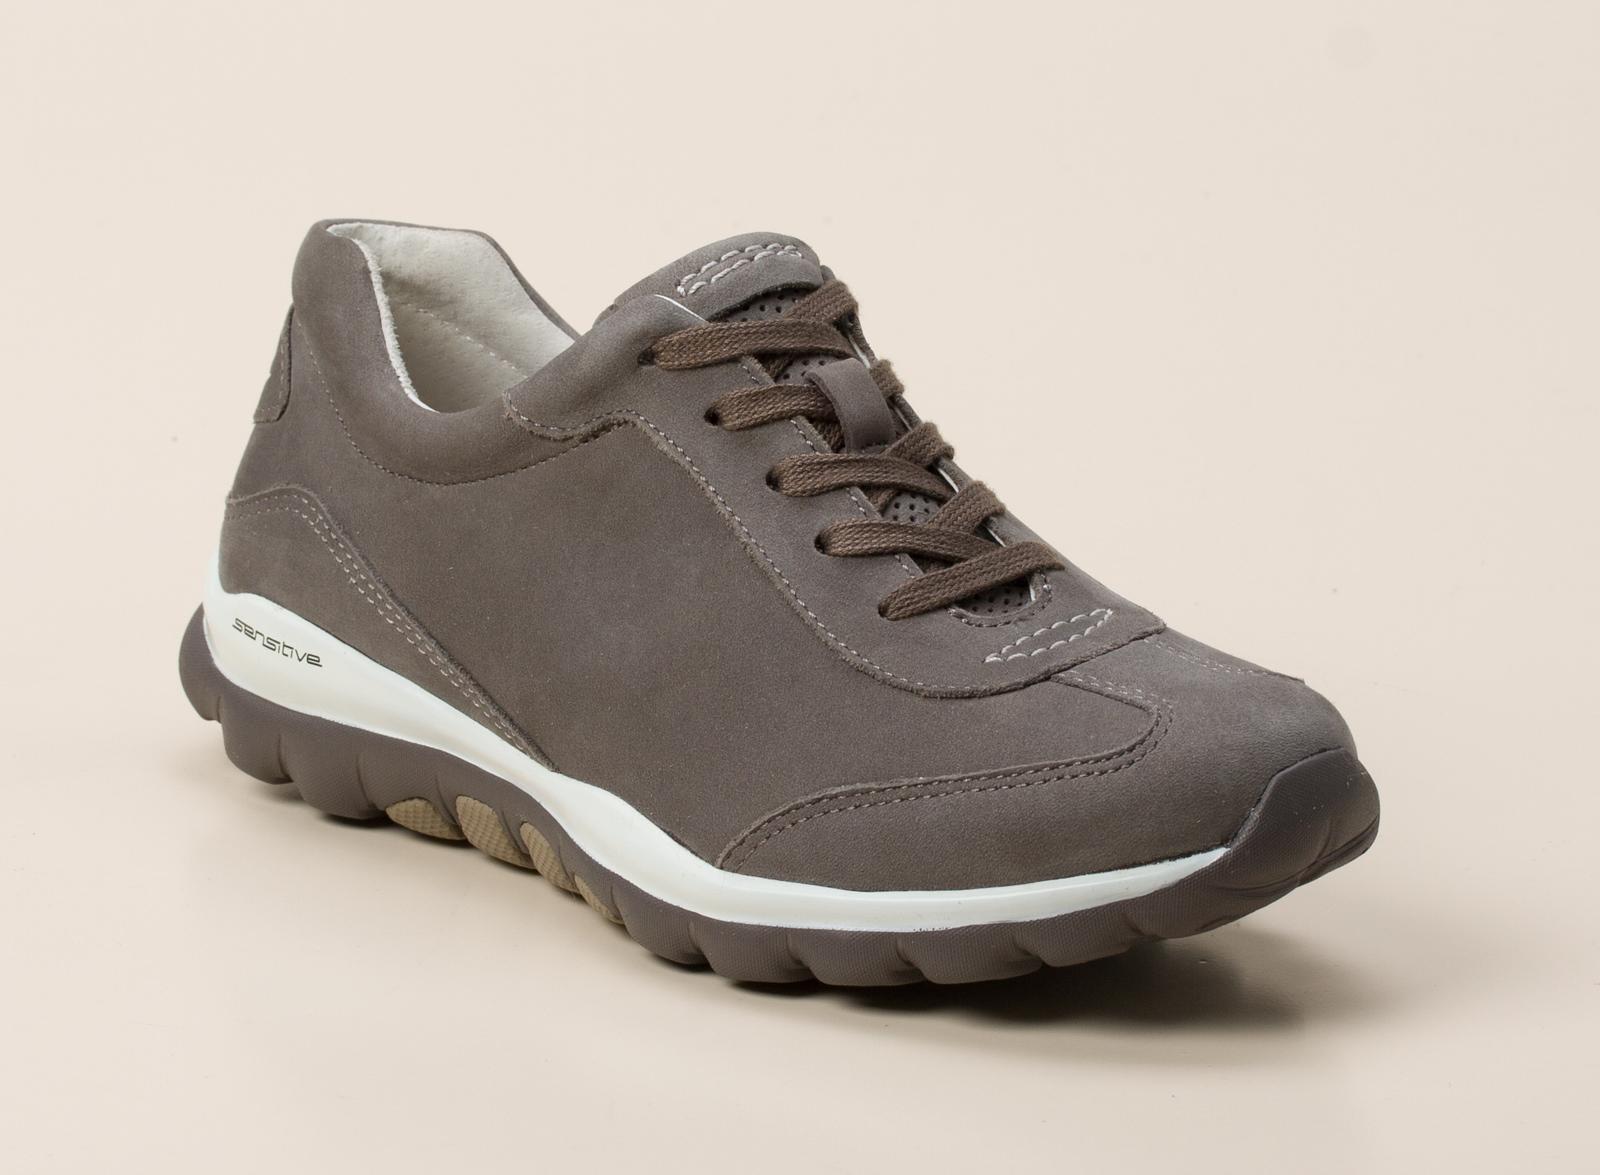 gabor comfort damen sneaker in beige grau kaufen zumnorde online shop. Black Bedroom Furniture Sets. Home Design Ideas